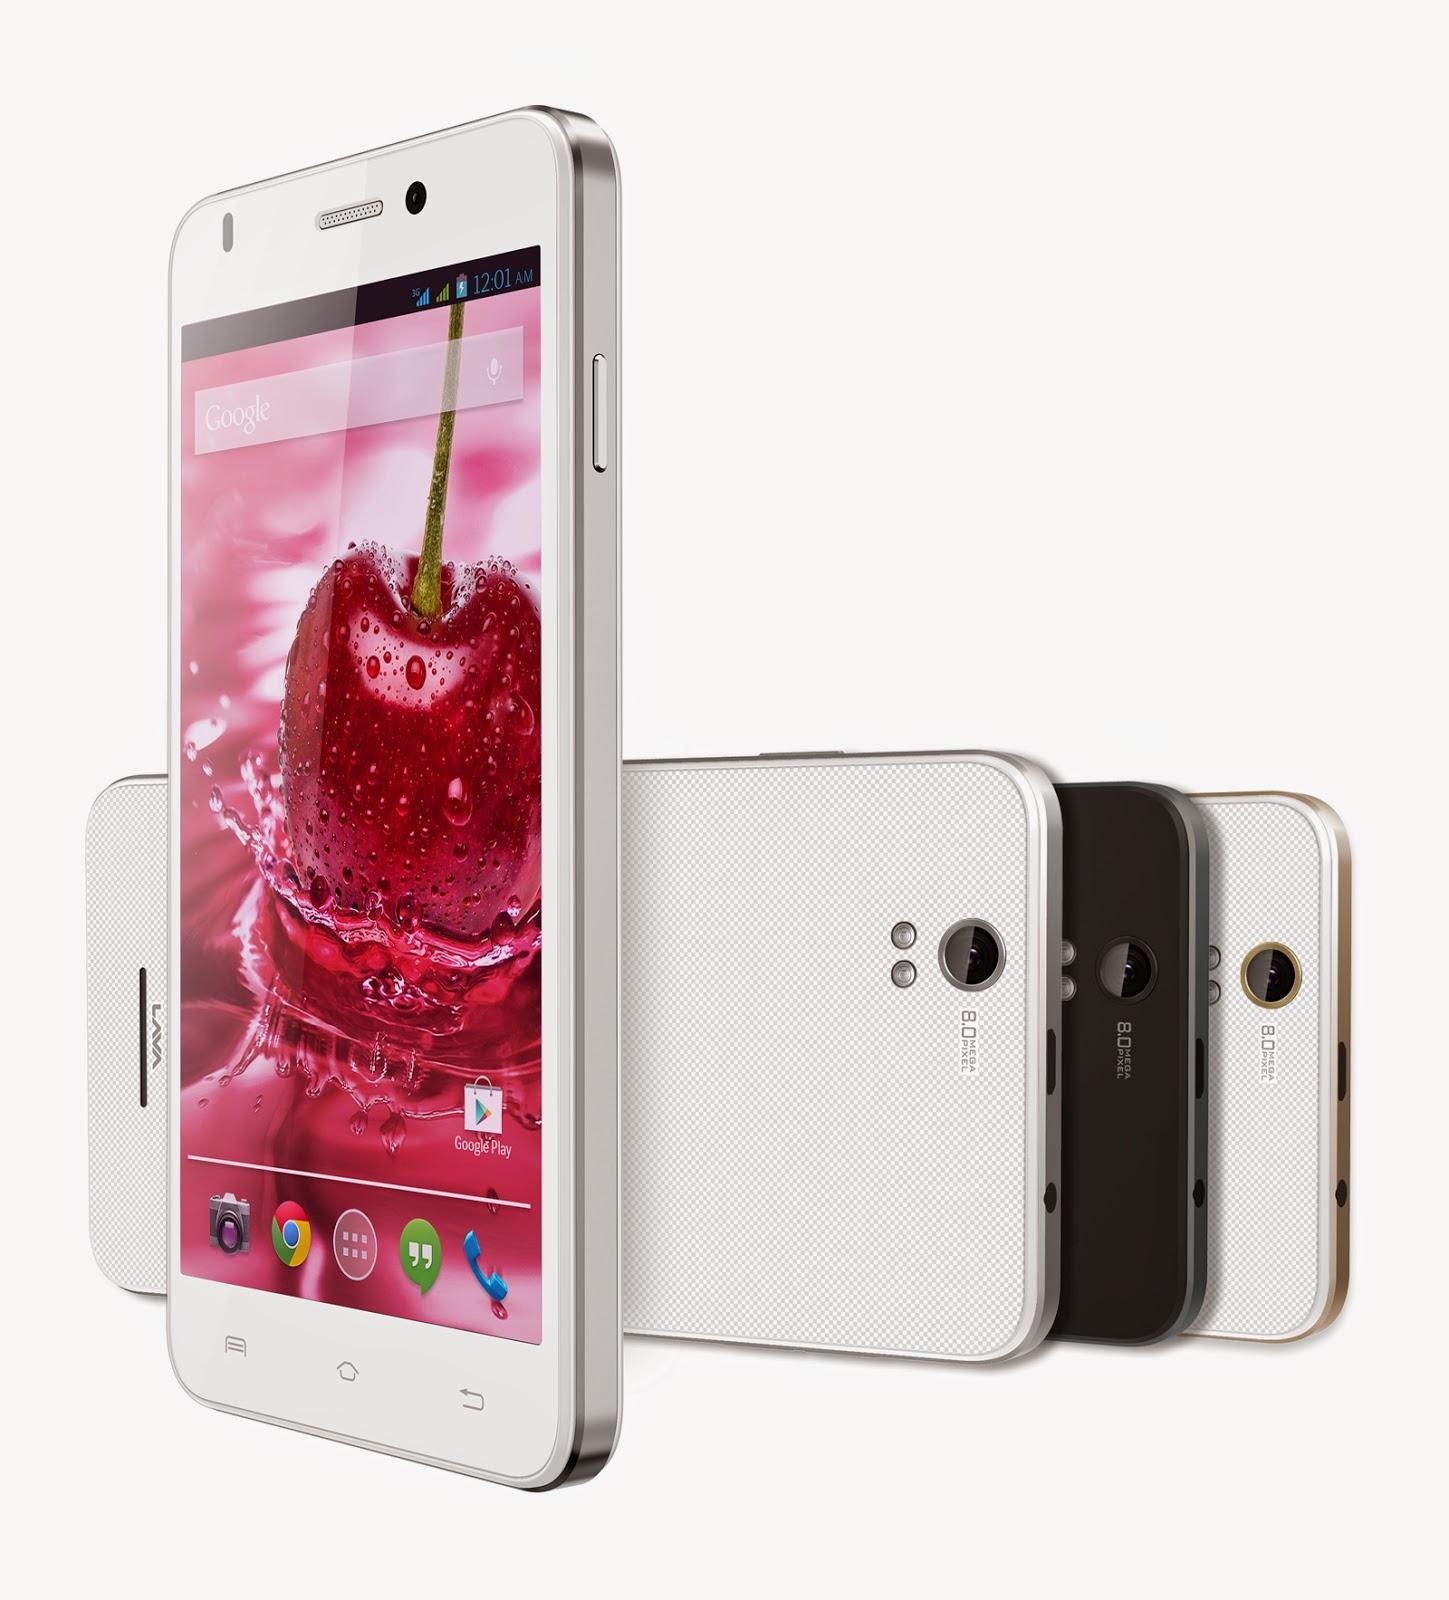 Gadgets, Mobile Phones New Launches in India - Lava Iris X1 Grand